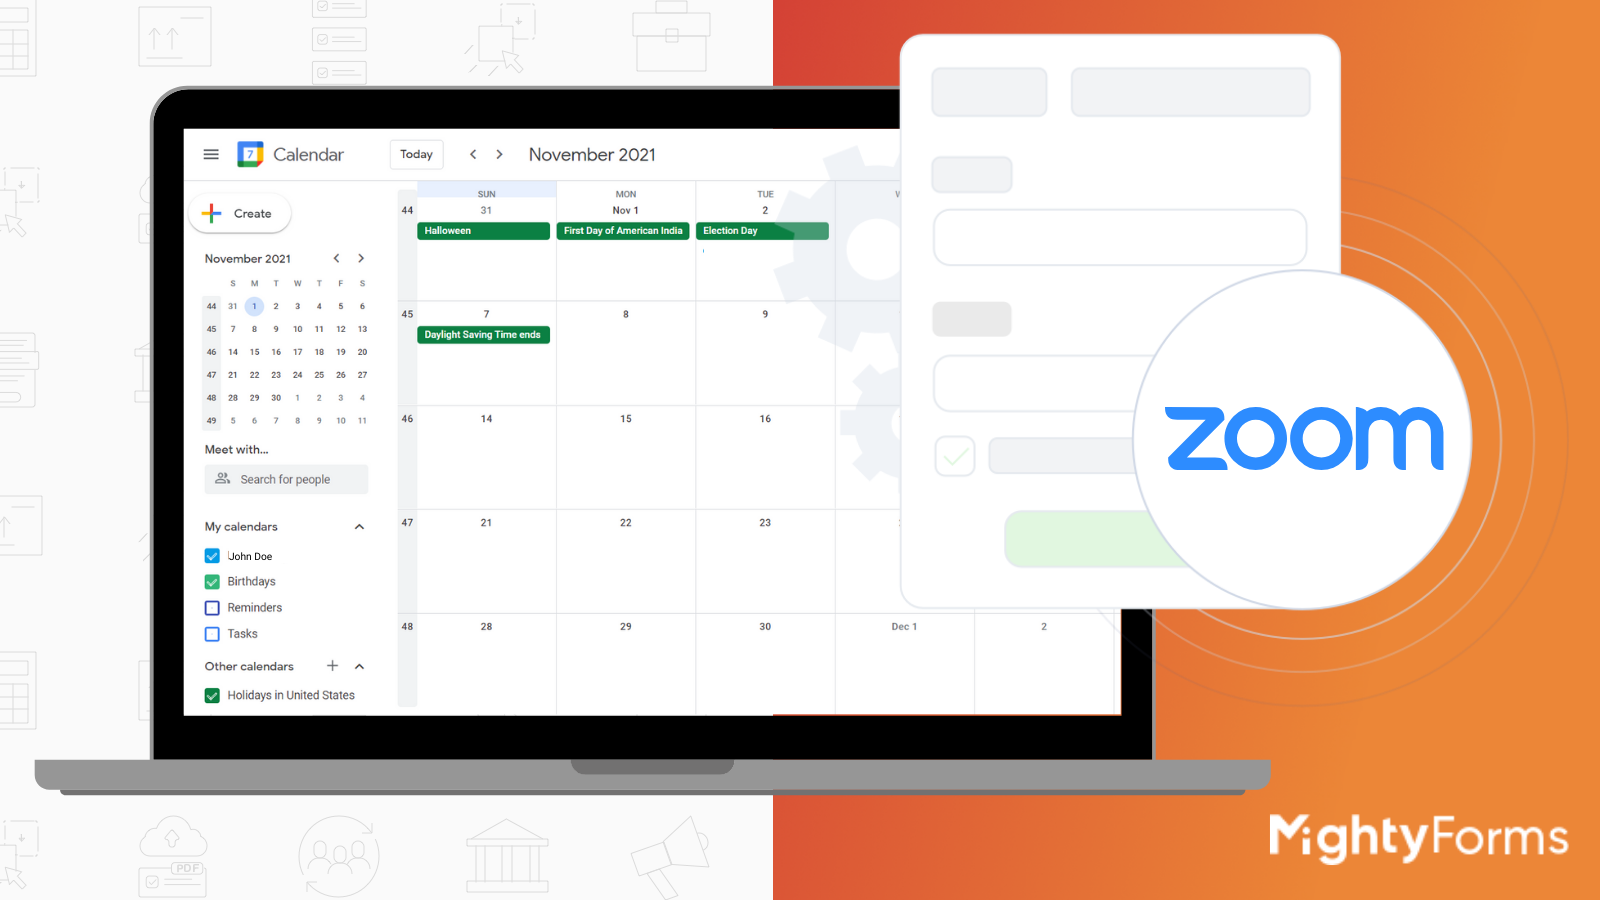 online form builder integration with Zoom and Google Calendar